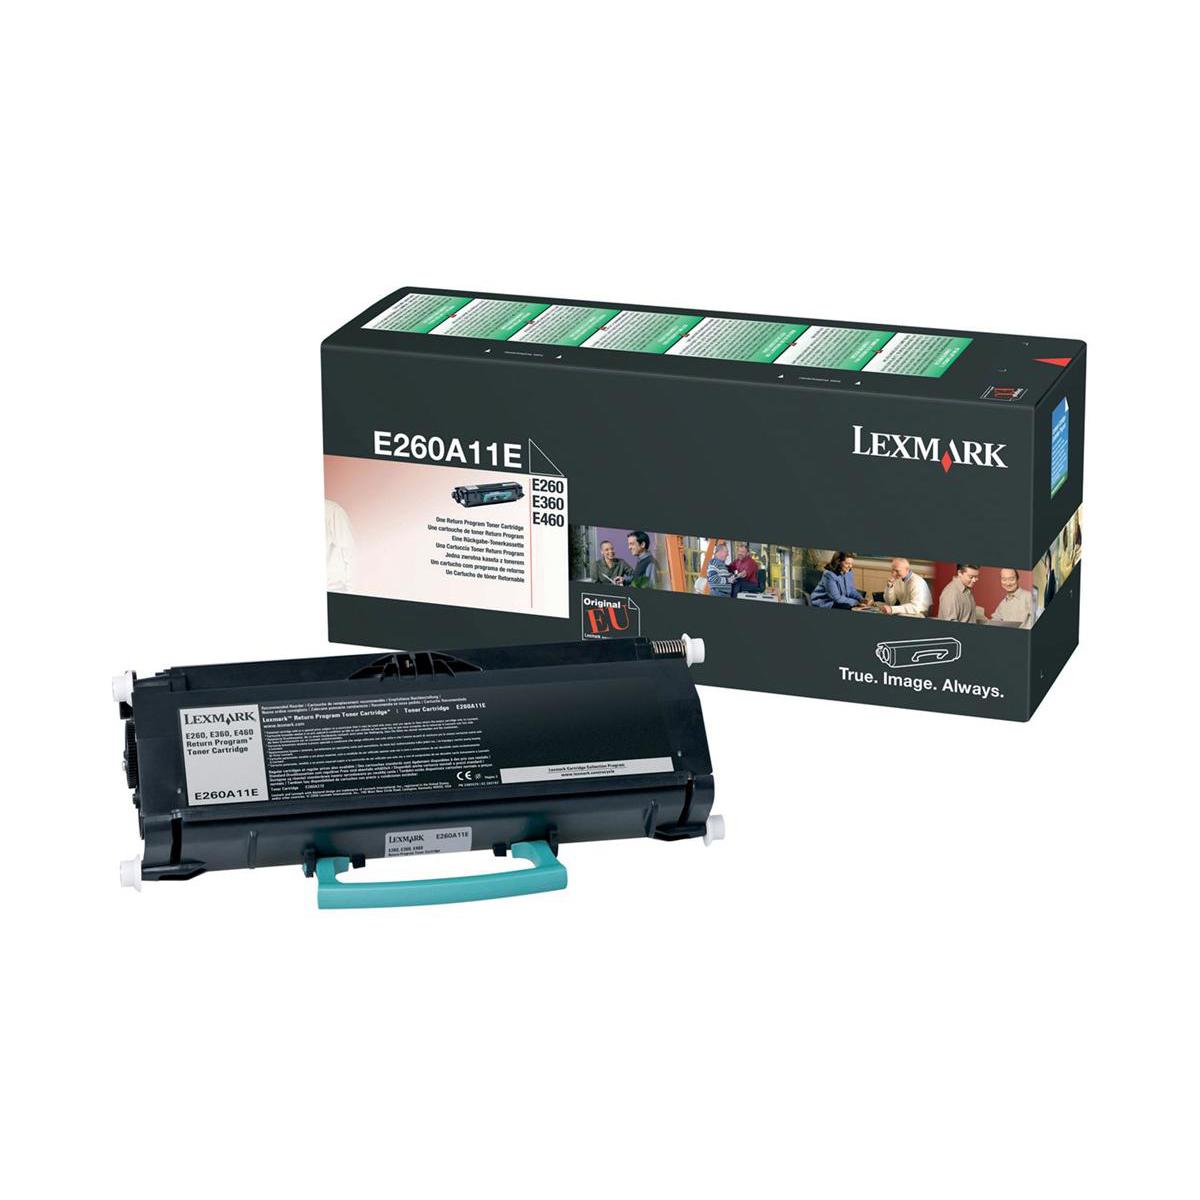 Lexmark E260/E360/E460 Laser Toner Cartridge Return Programme Page Life 3500pp Black Ref E260A11E